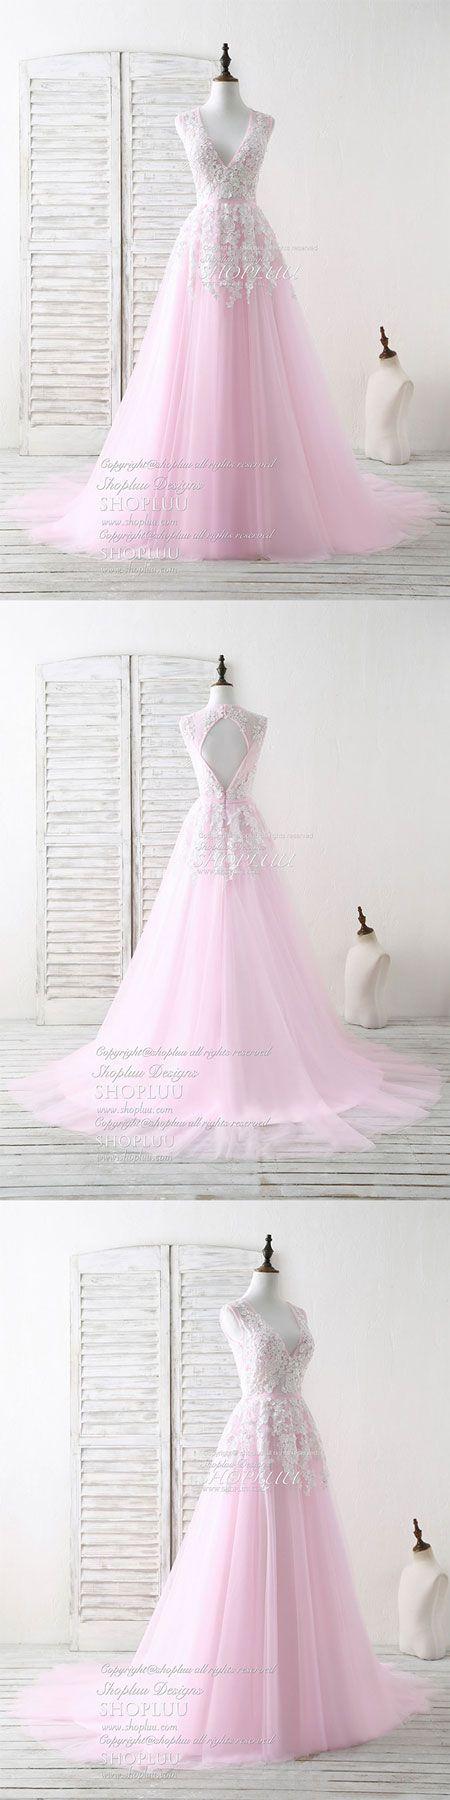 769 best Kleider images on Pinterest | Ballroom dress, Birthday ...